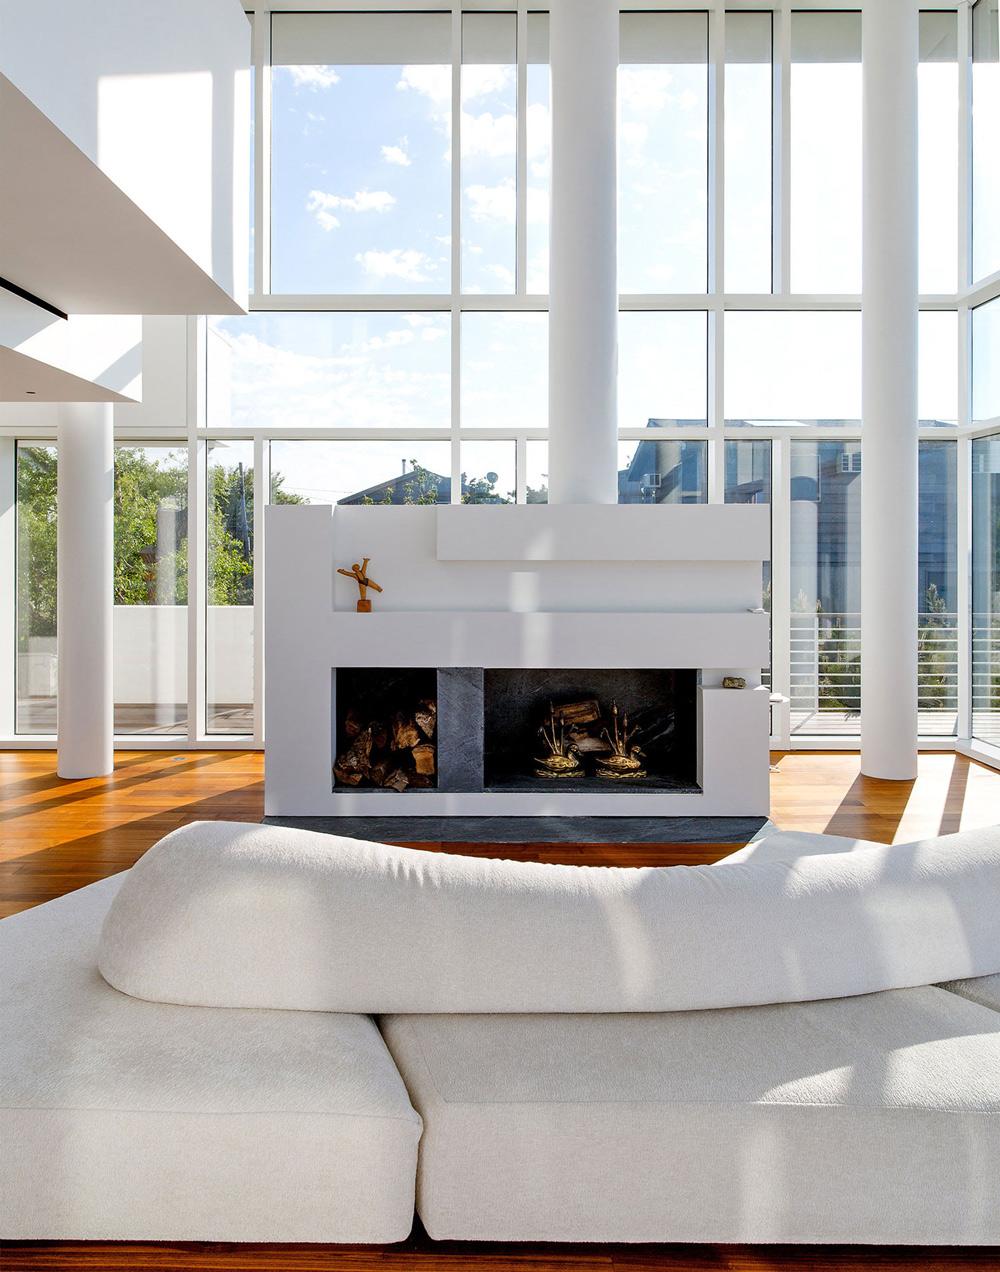 Contemporary Fireplace, Richard Meier's Fire Island House